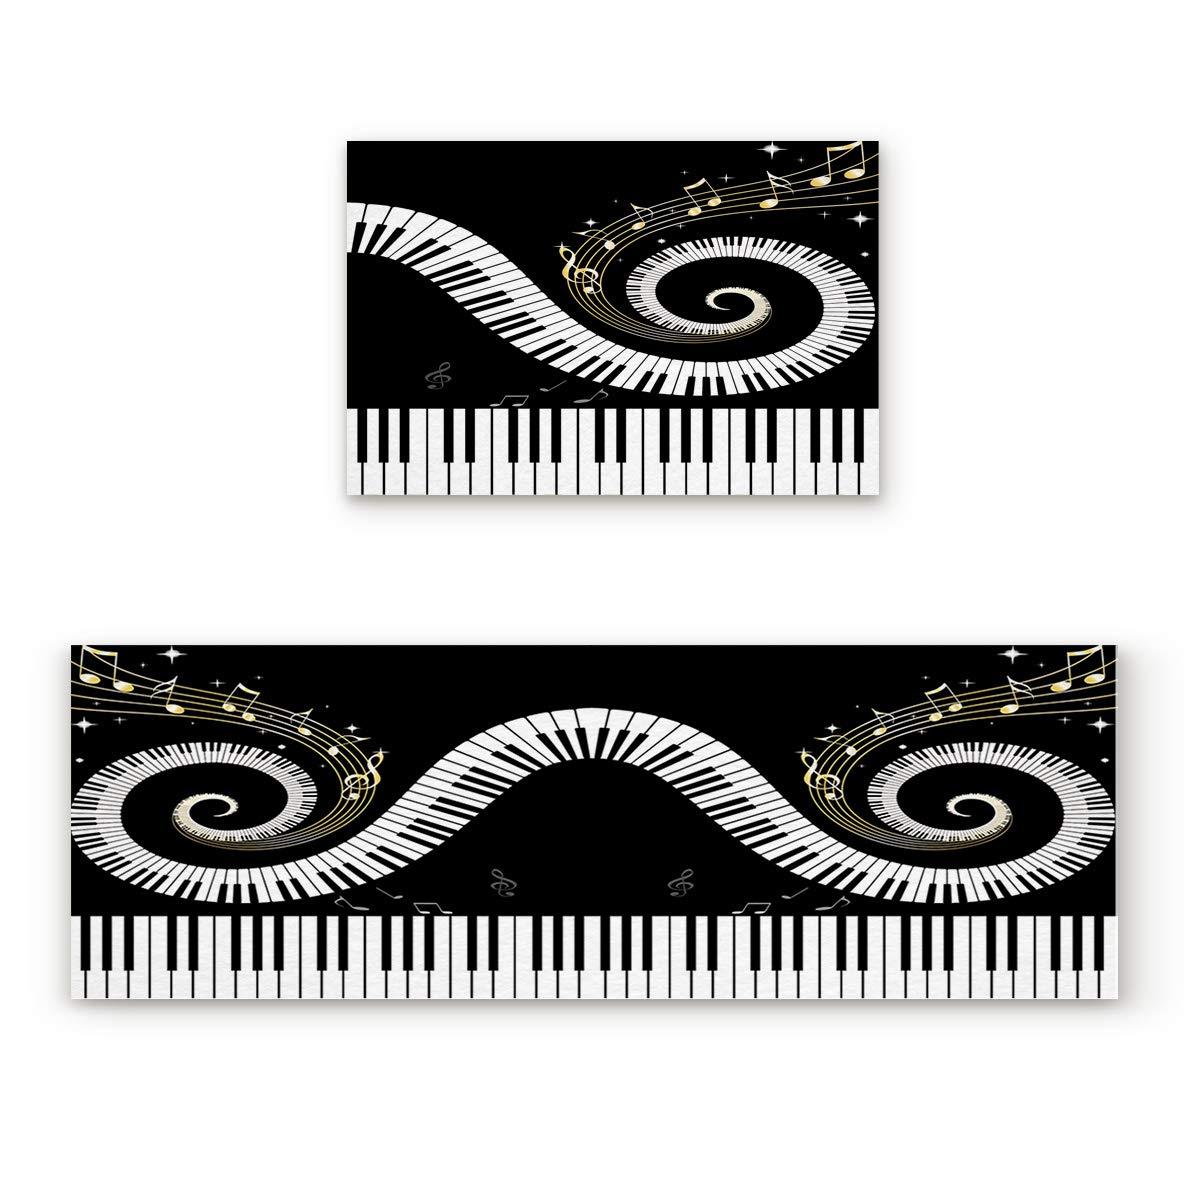 Musical Note5fiy6158 23.6x35.4In+23.6x70.9In Findamy Non-Slip Indoor Door Mat Entrance Rug Rectangle Absorbent Moisture Floor Carpet for White and Red Stripe Pattern Doormat 23.6x35.4In+23.6x70.9In